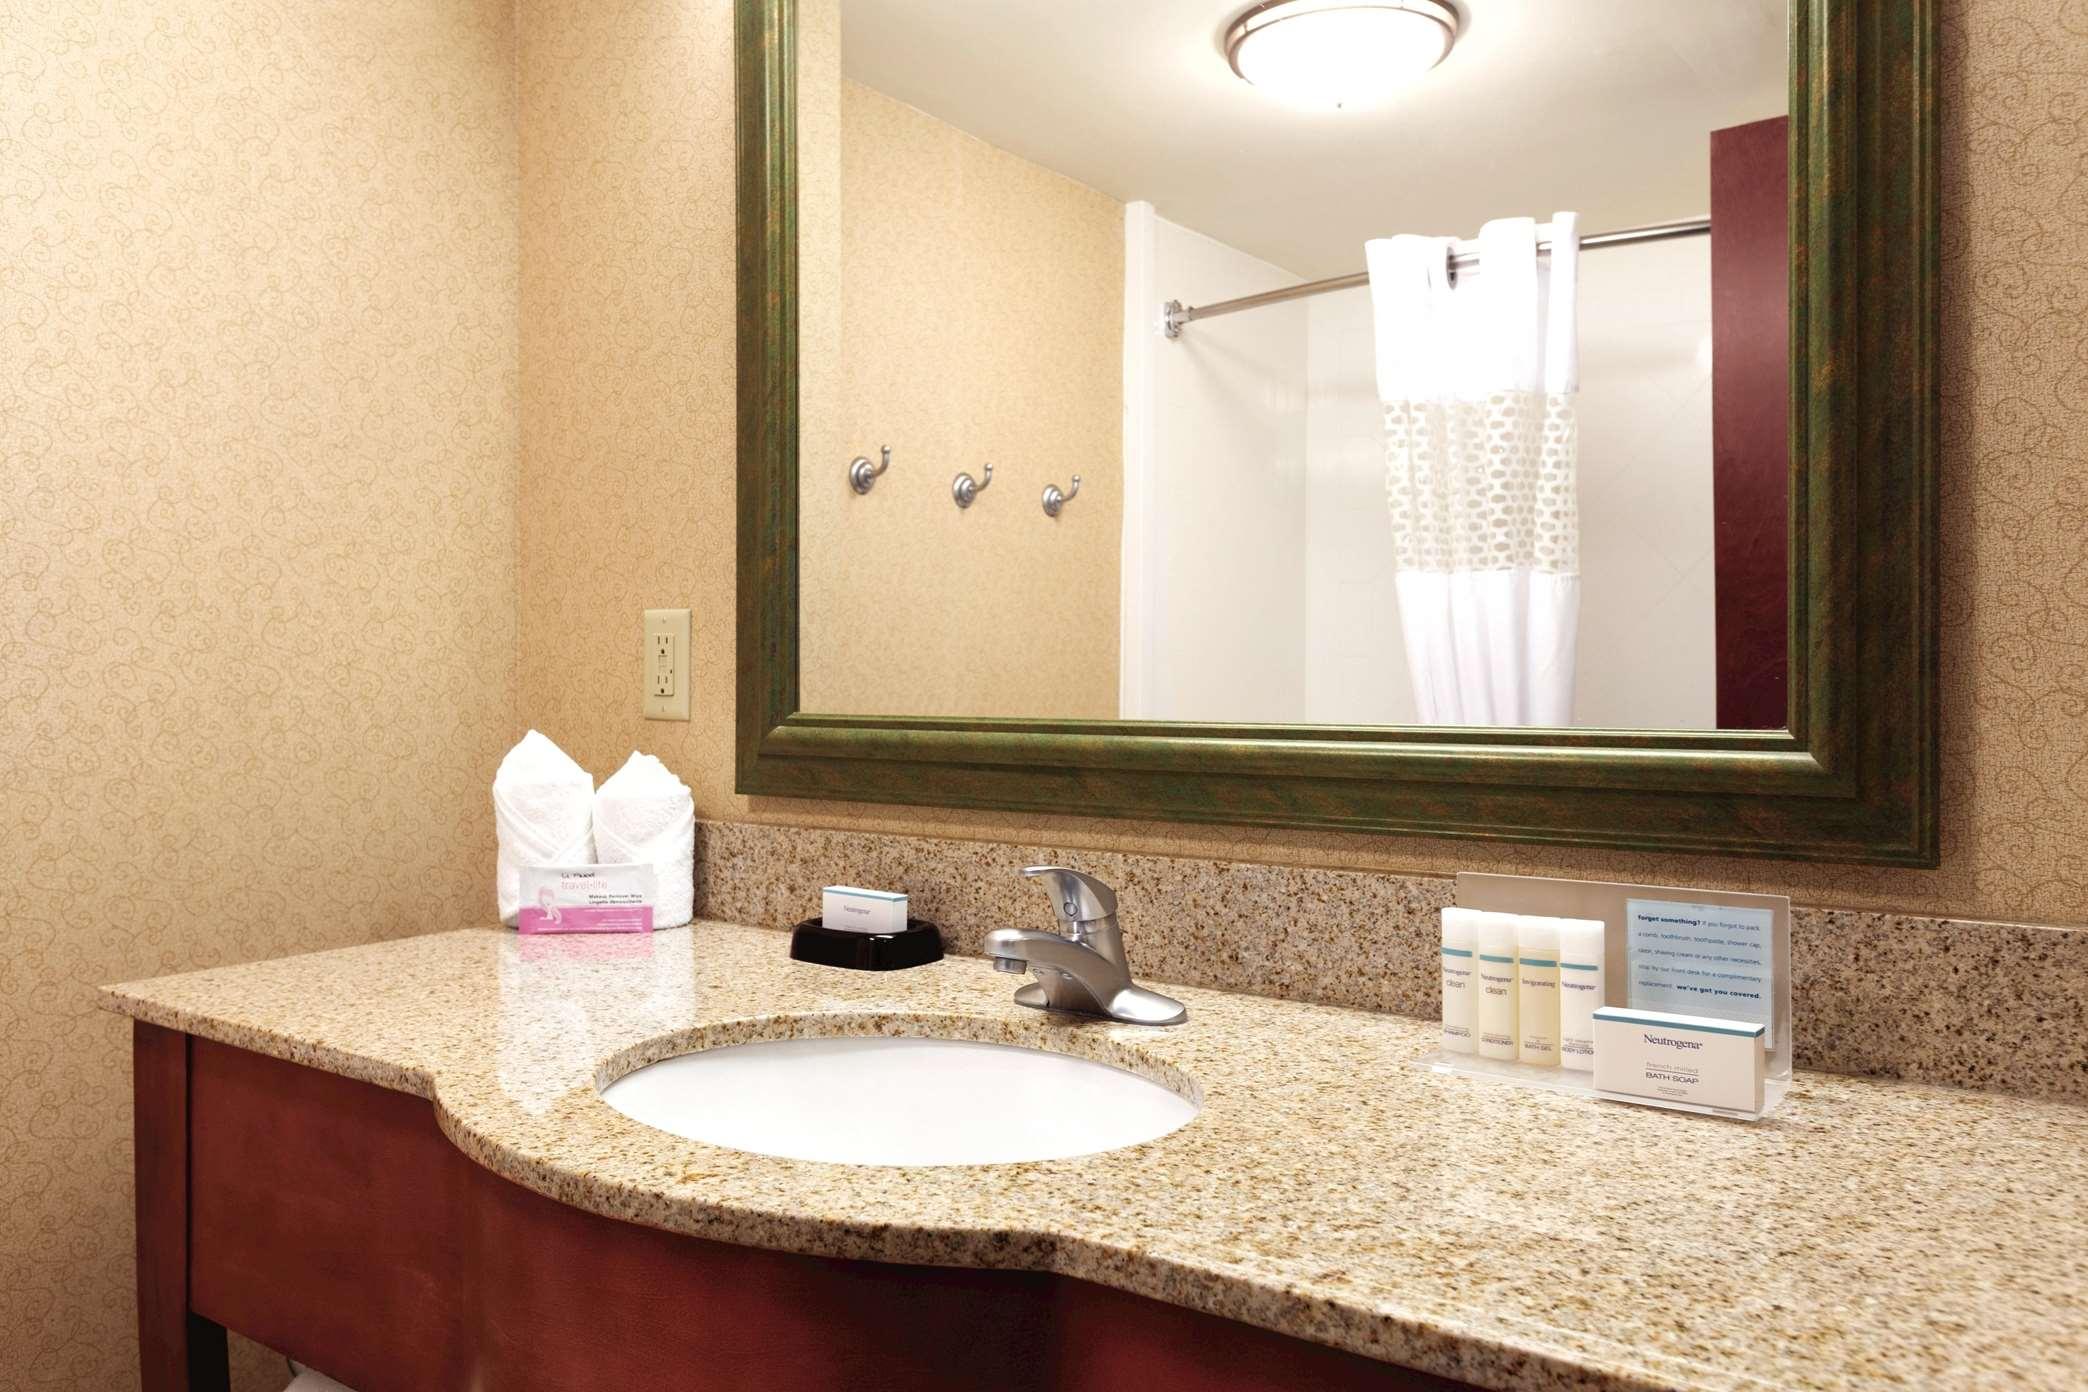 Hampton Inn & Suites Greenfield image 38